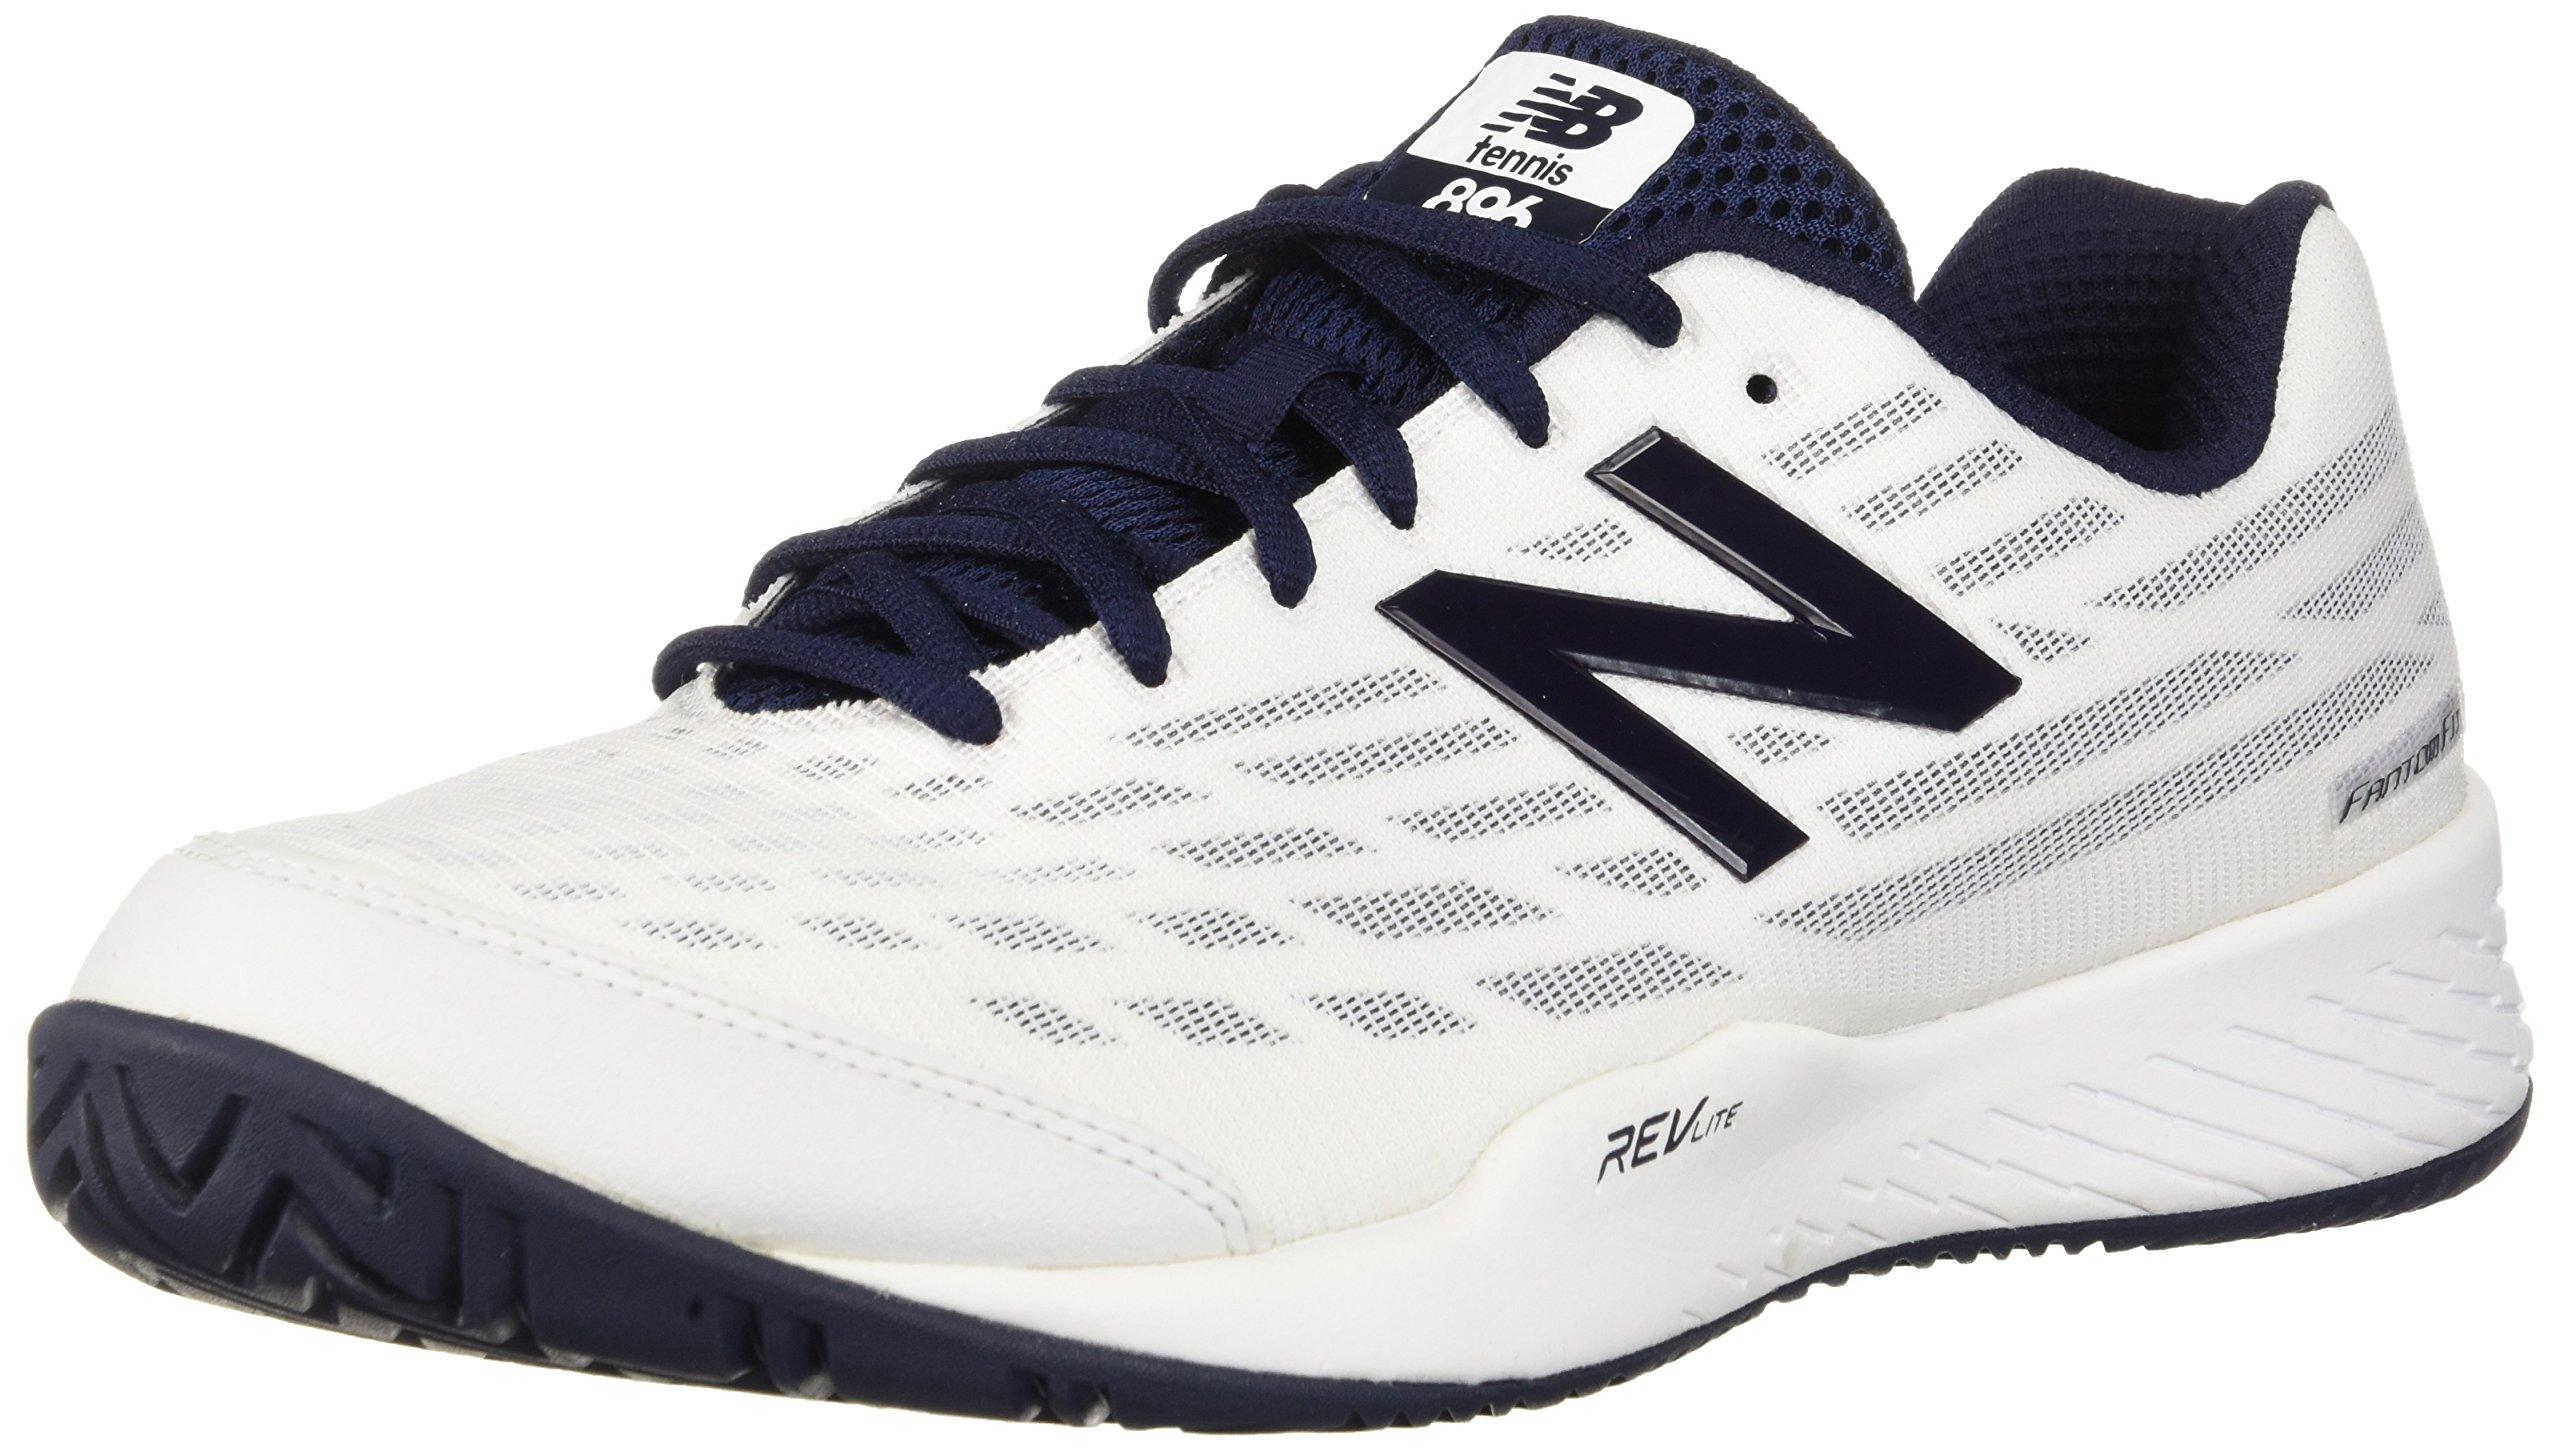 New Balance Men's 896v2 Hard Court Tennis Shoe, White, 11 2E US